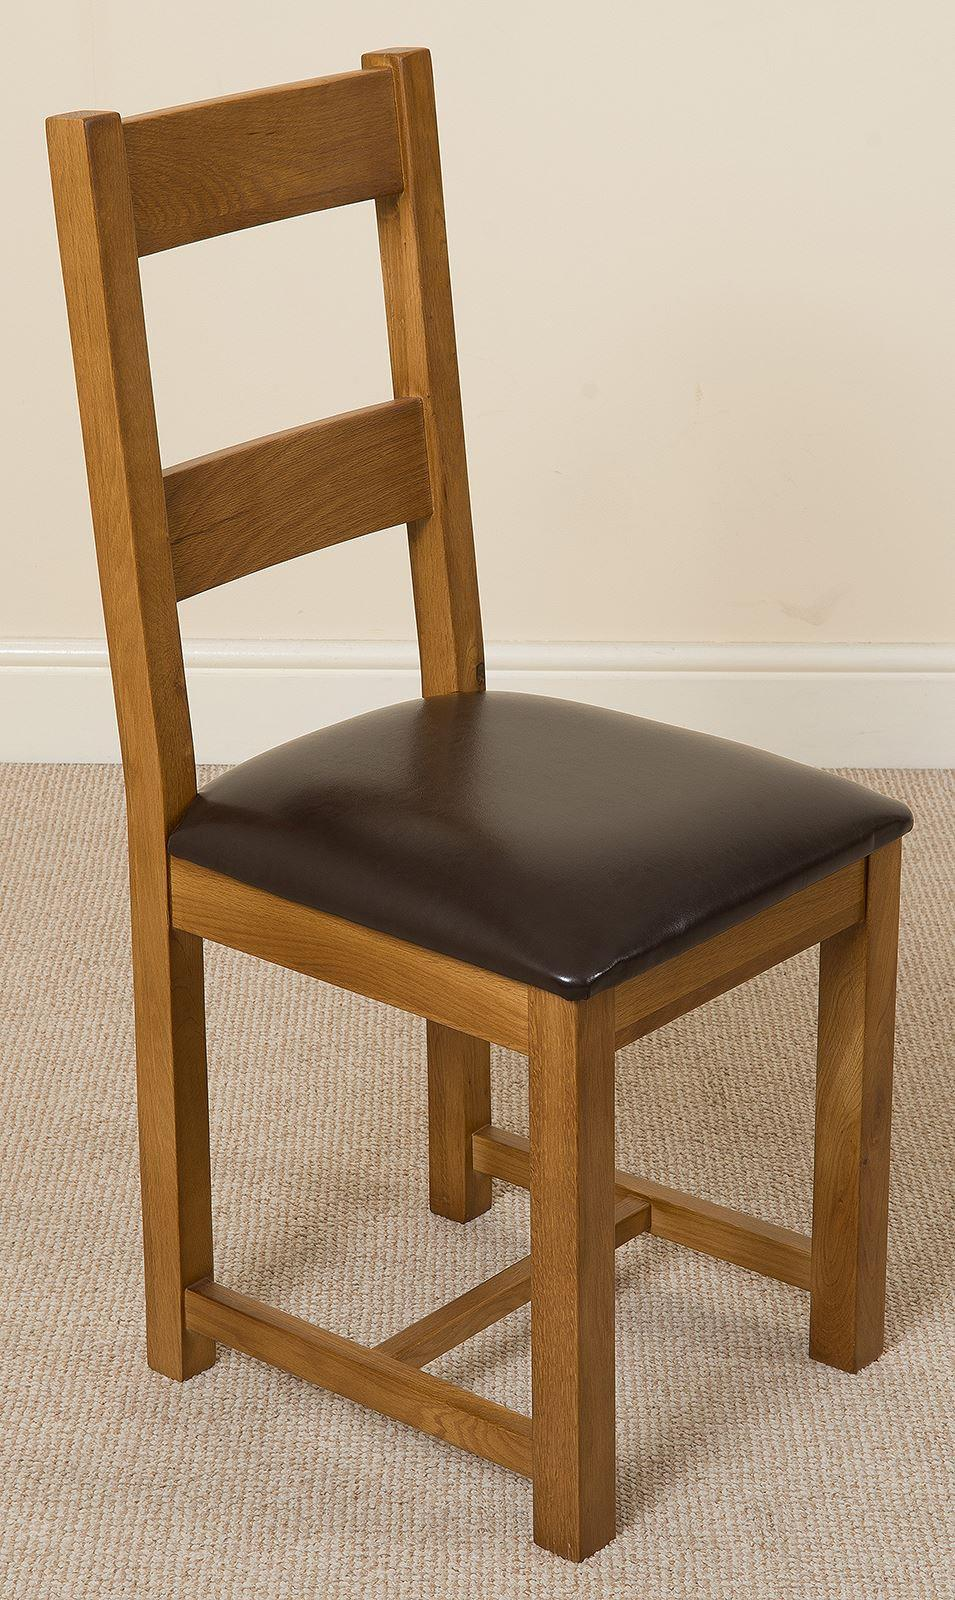 Lincoln rustic oak amp brown leather braced dining chair for  : 6C08EF3584CD3D73C7B6BA726CB605ED from www.go-furniture.co.uk size 955 x 1600 jpeg 275kB